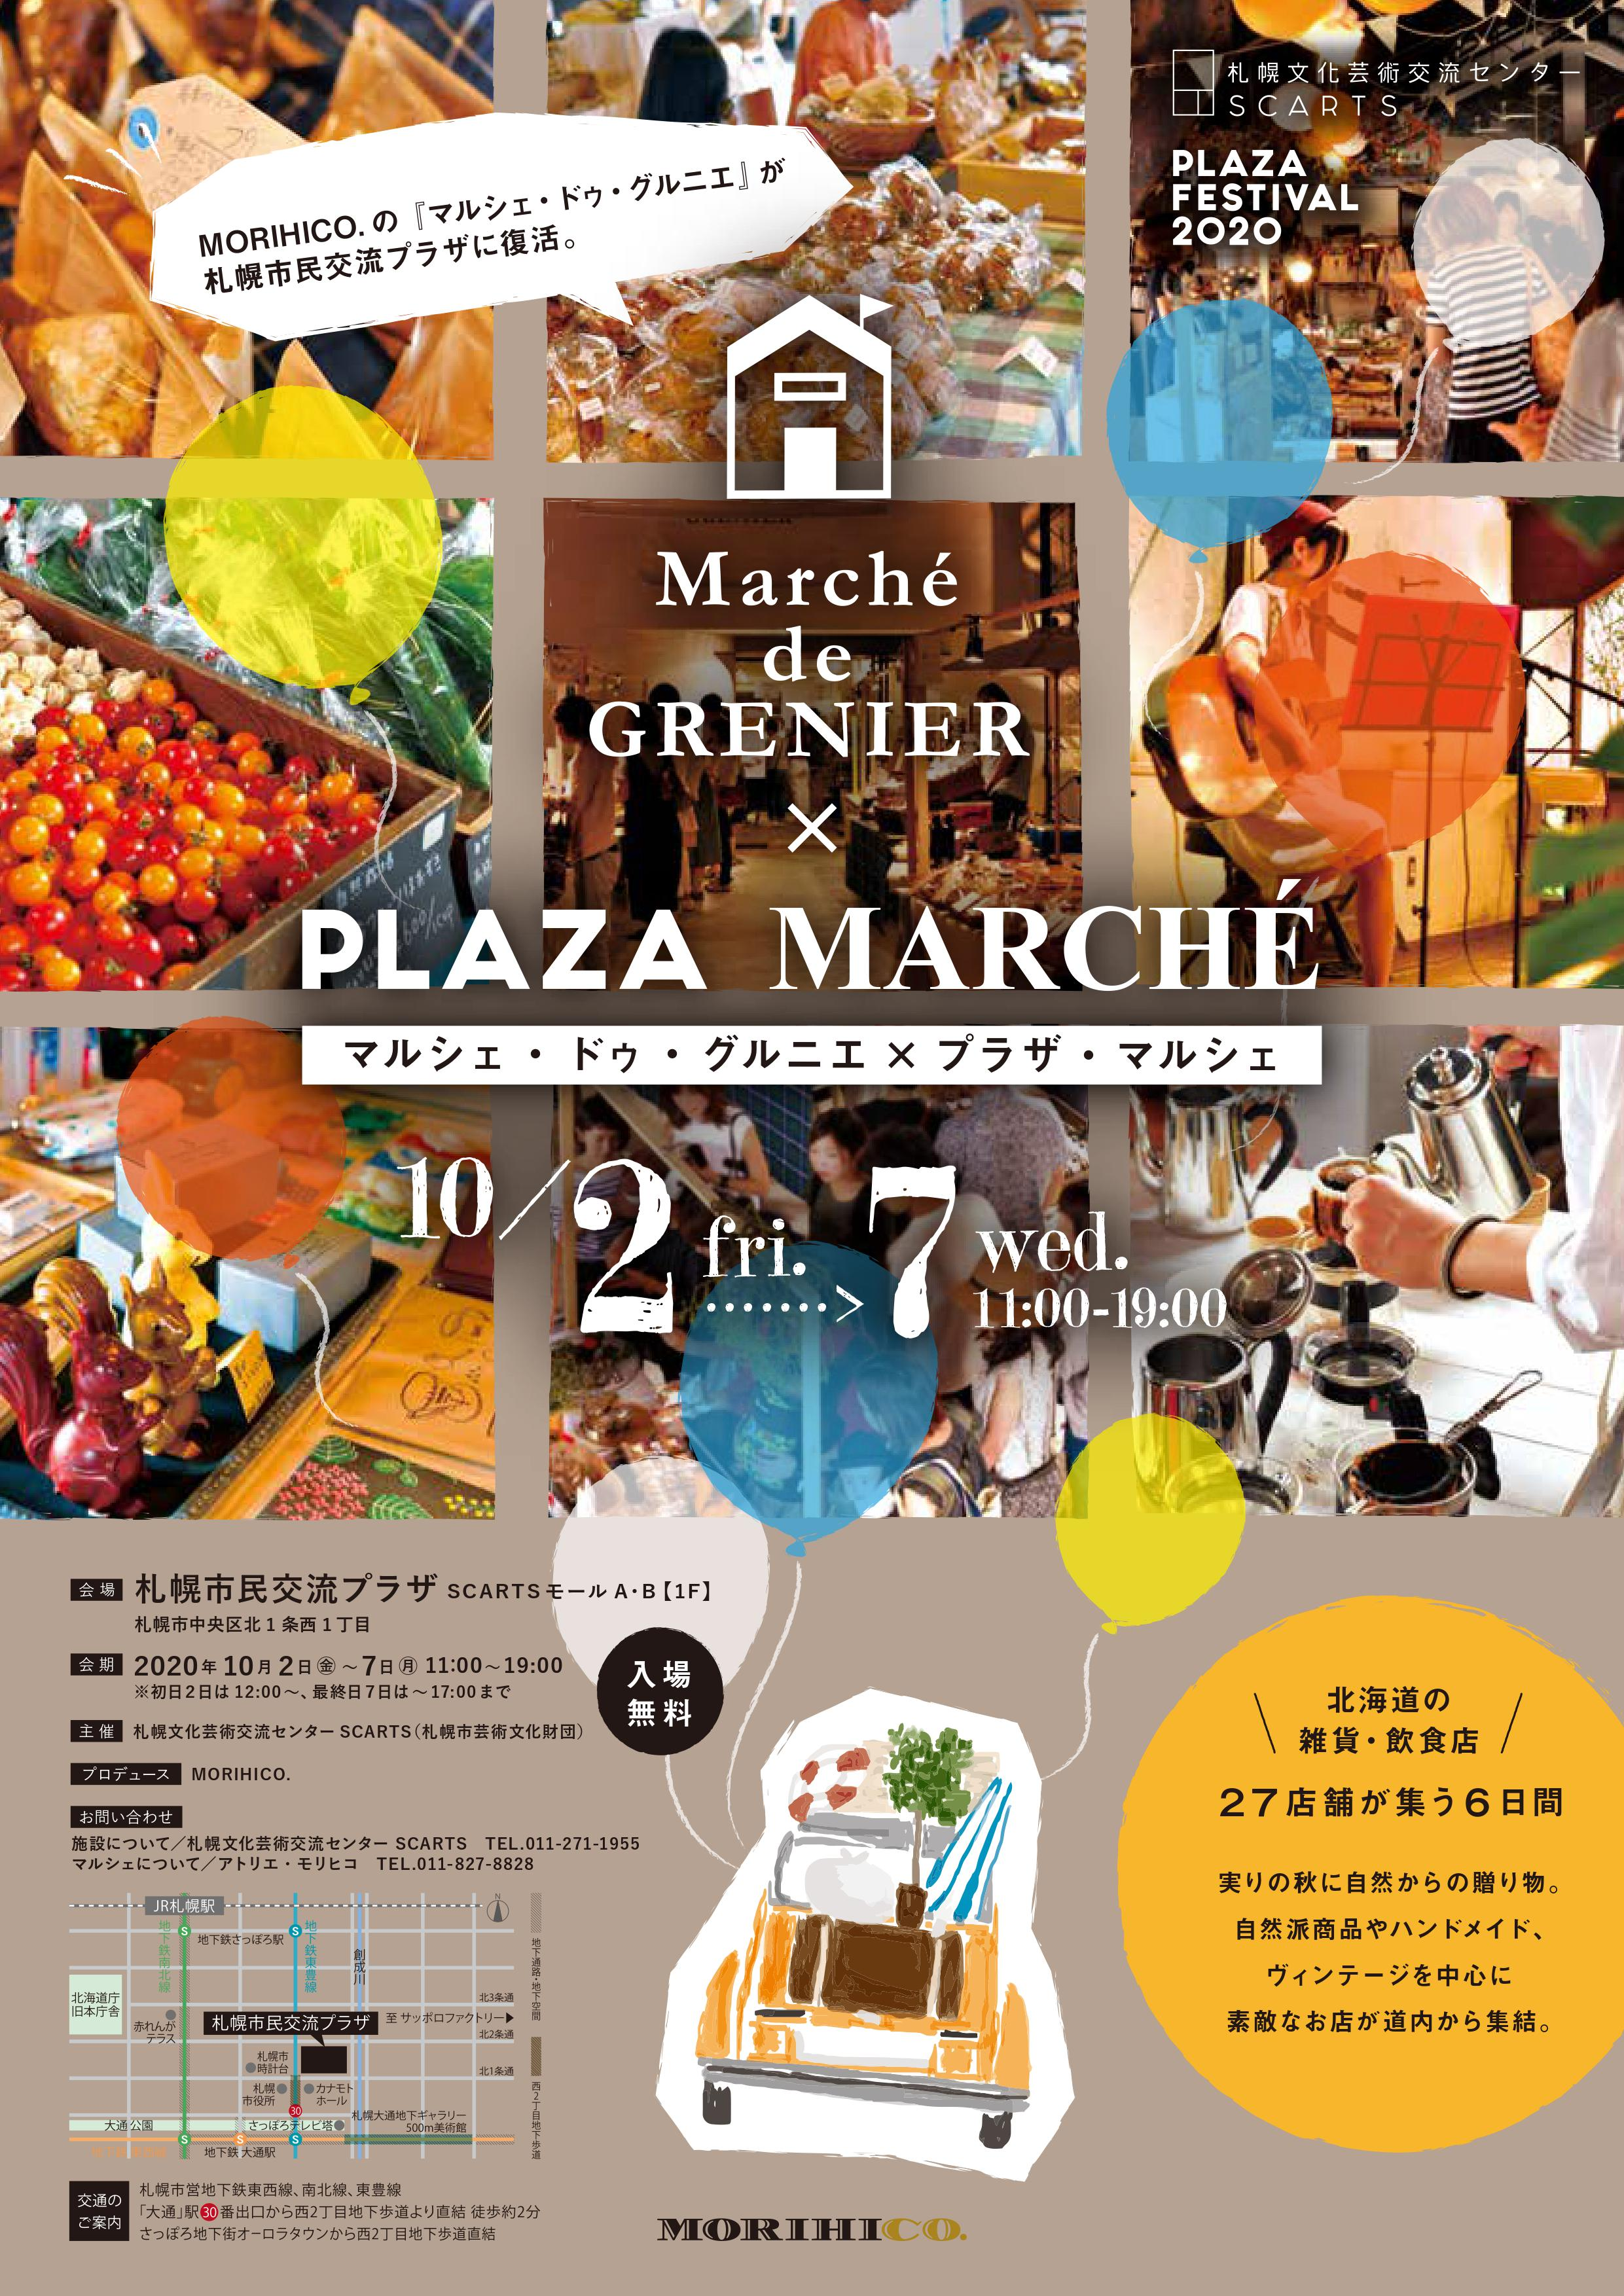 Marché de GRENIER × PLAZA MARCHÉ 出展のお知らせ